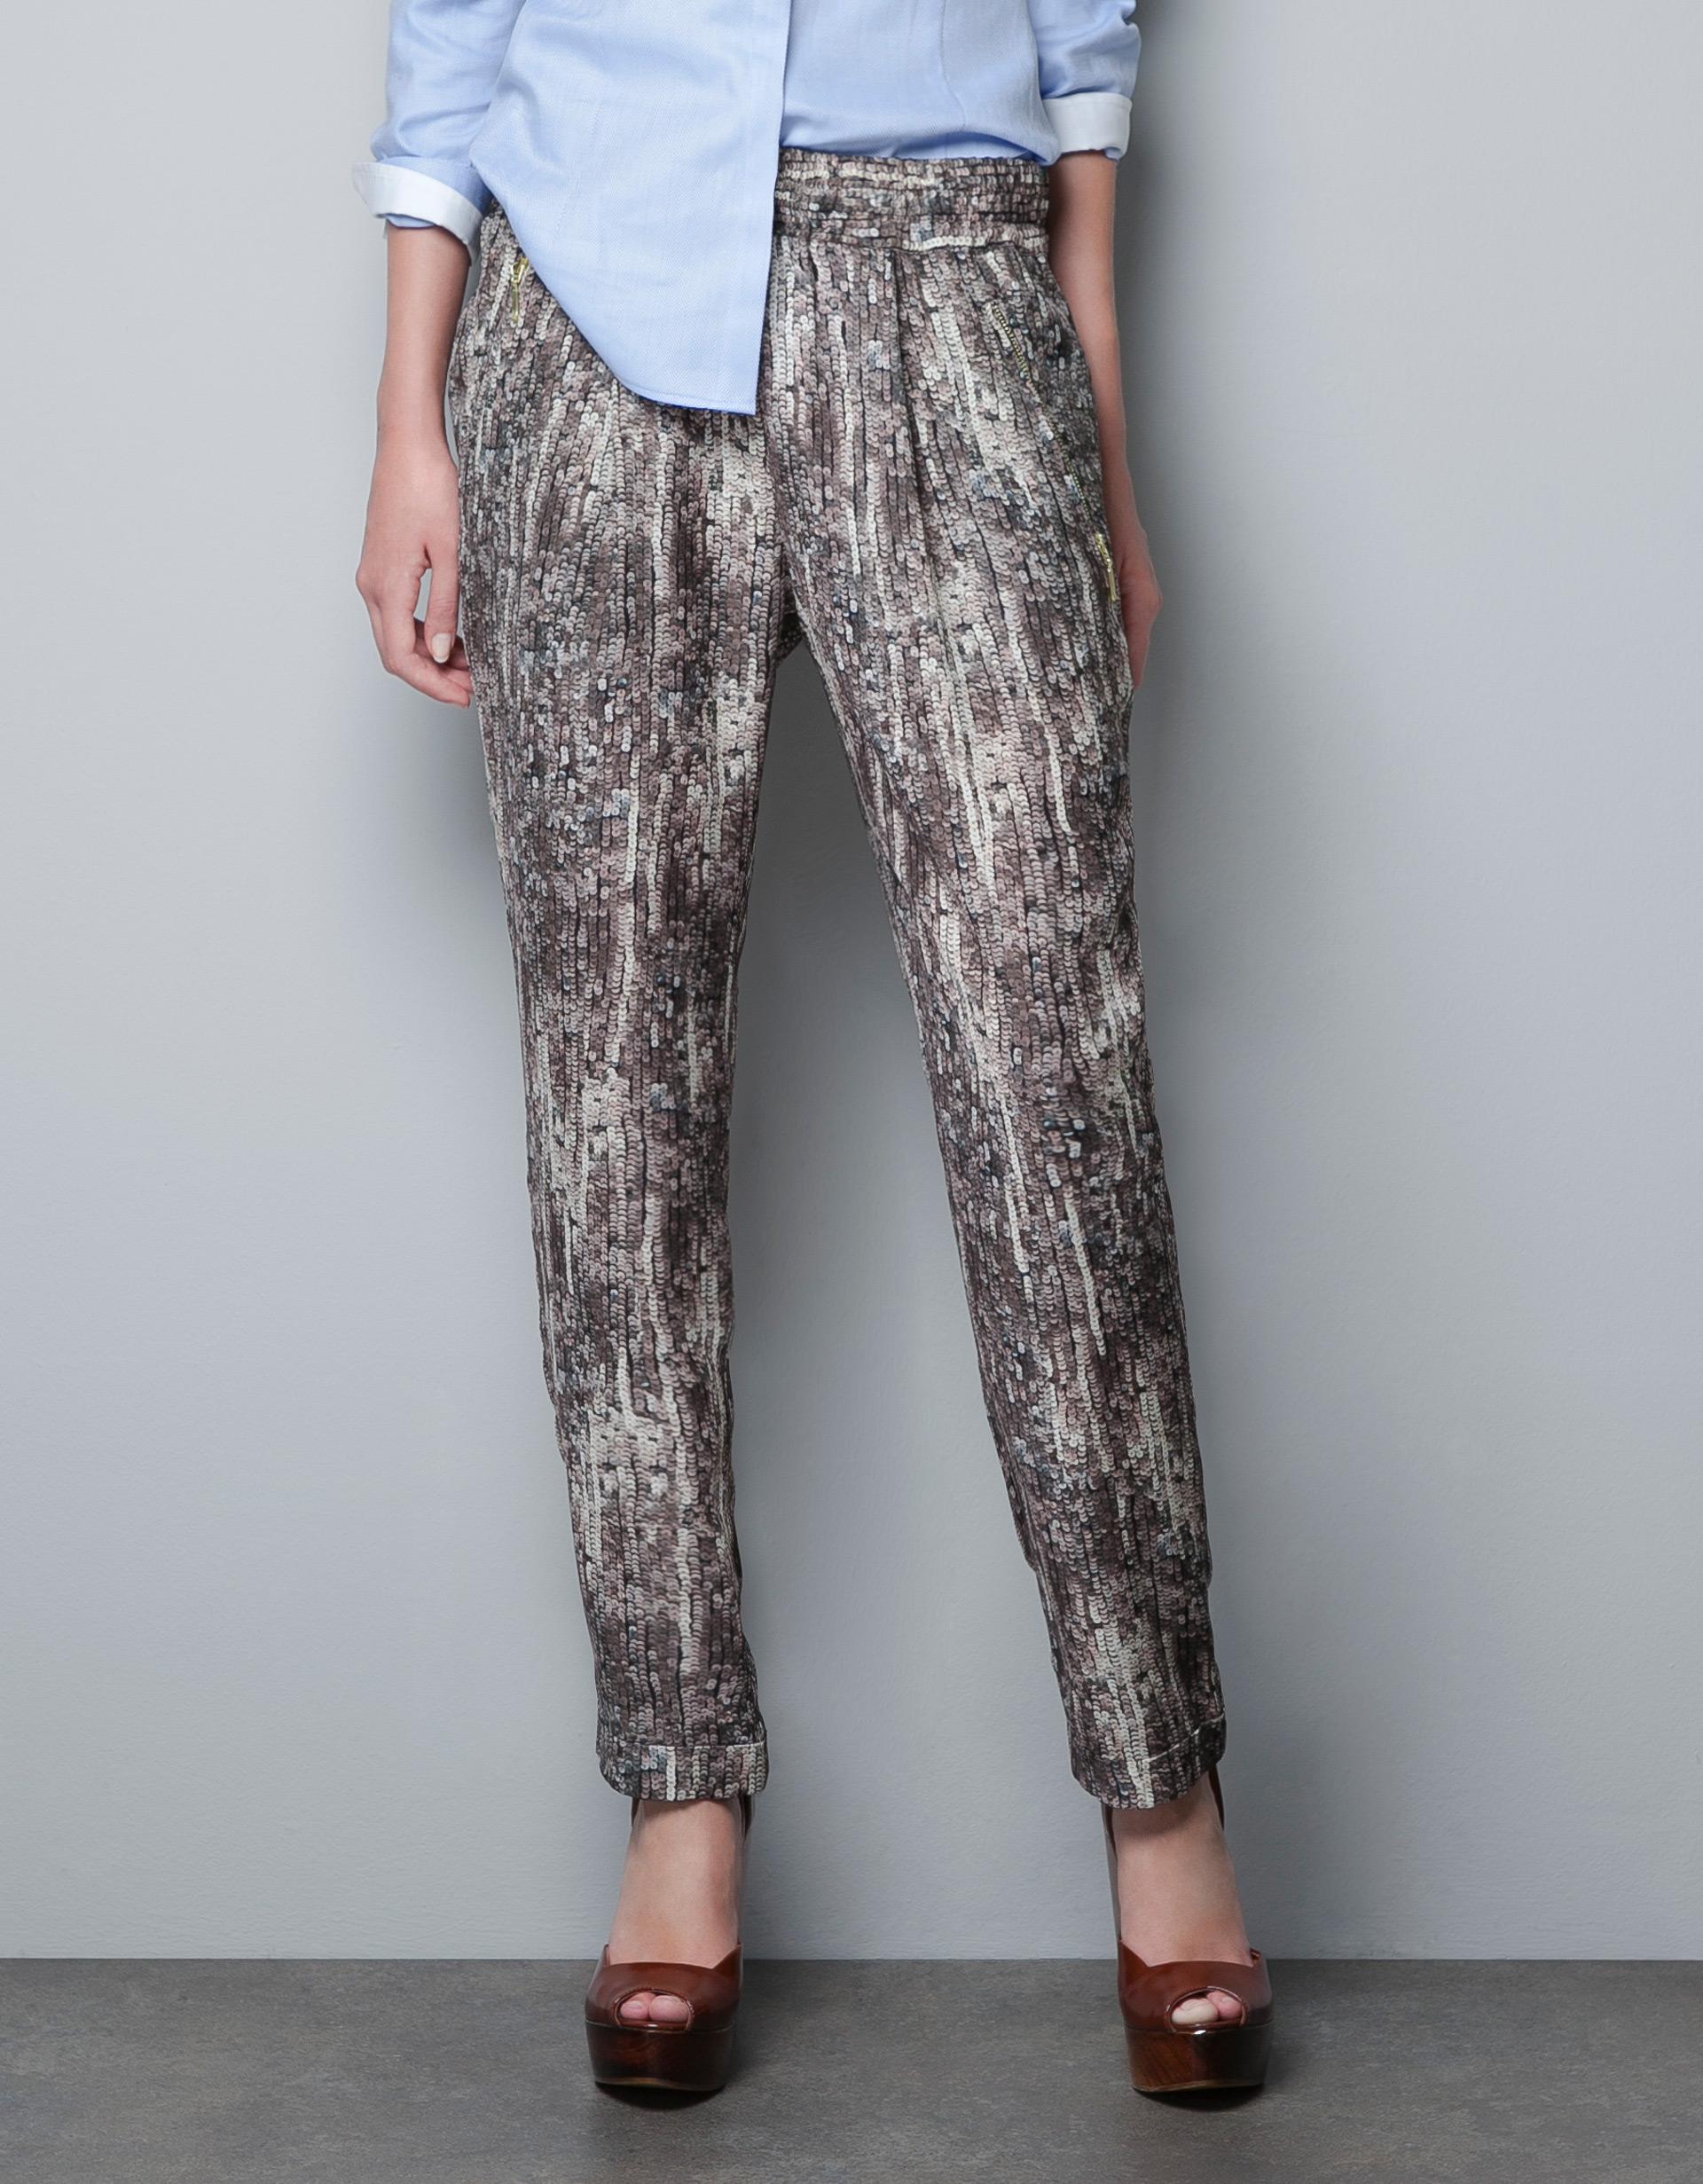 Sequin Print Pants by Zara